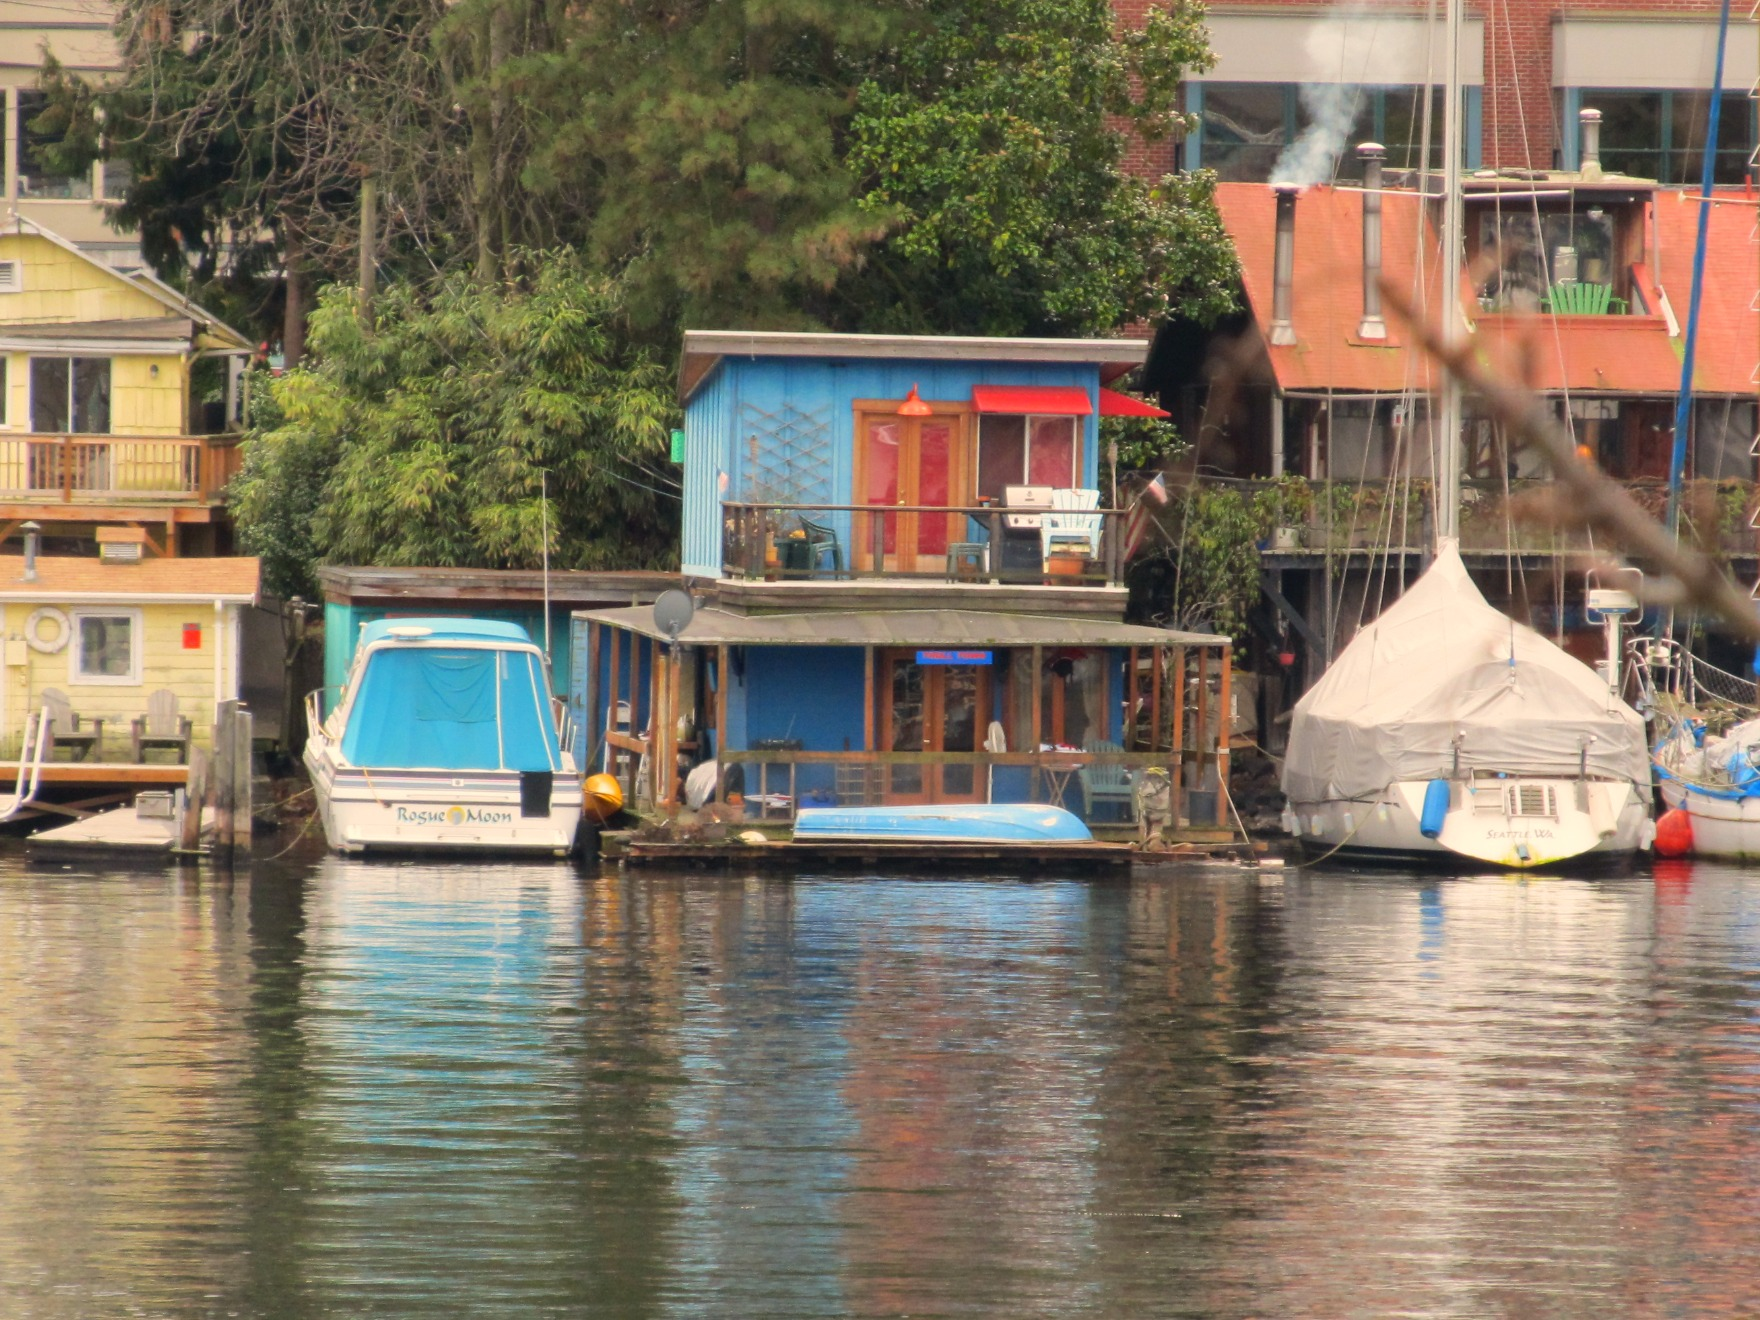 Own fee simple seattle houseboat or boat dock on lake union seattle afloat seattle - Floating house seattle ...